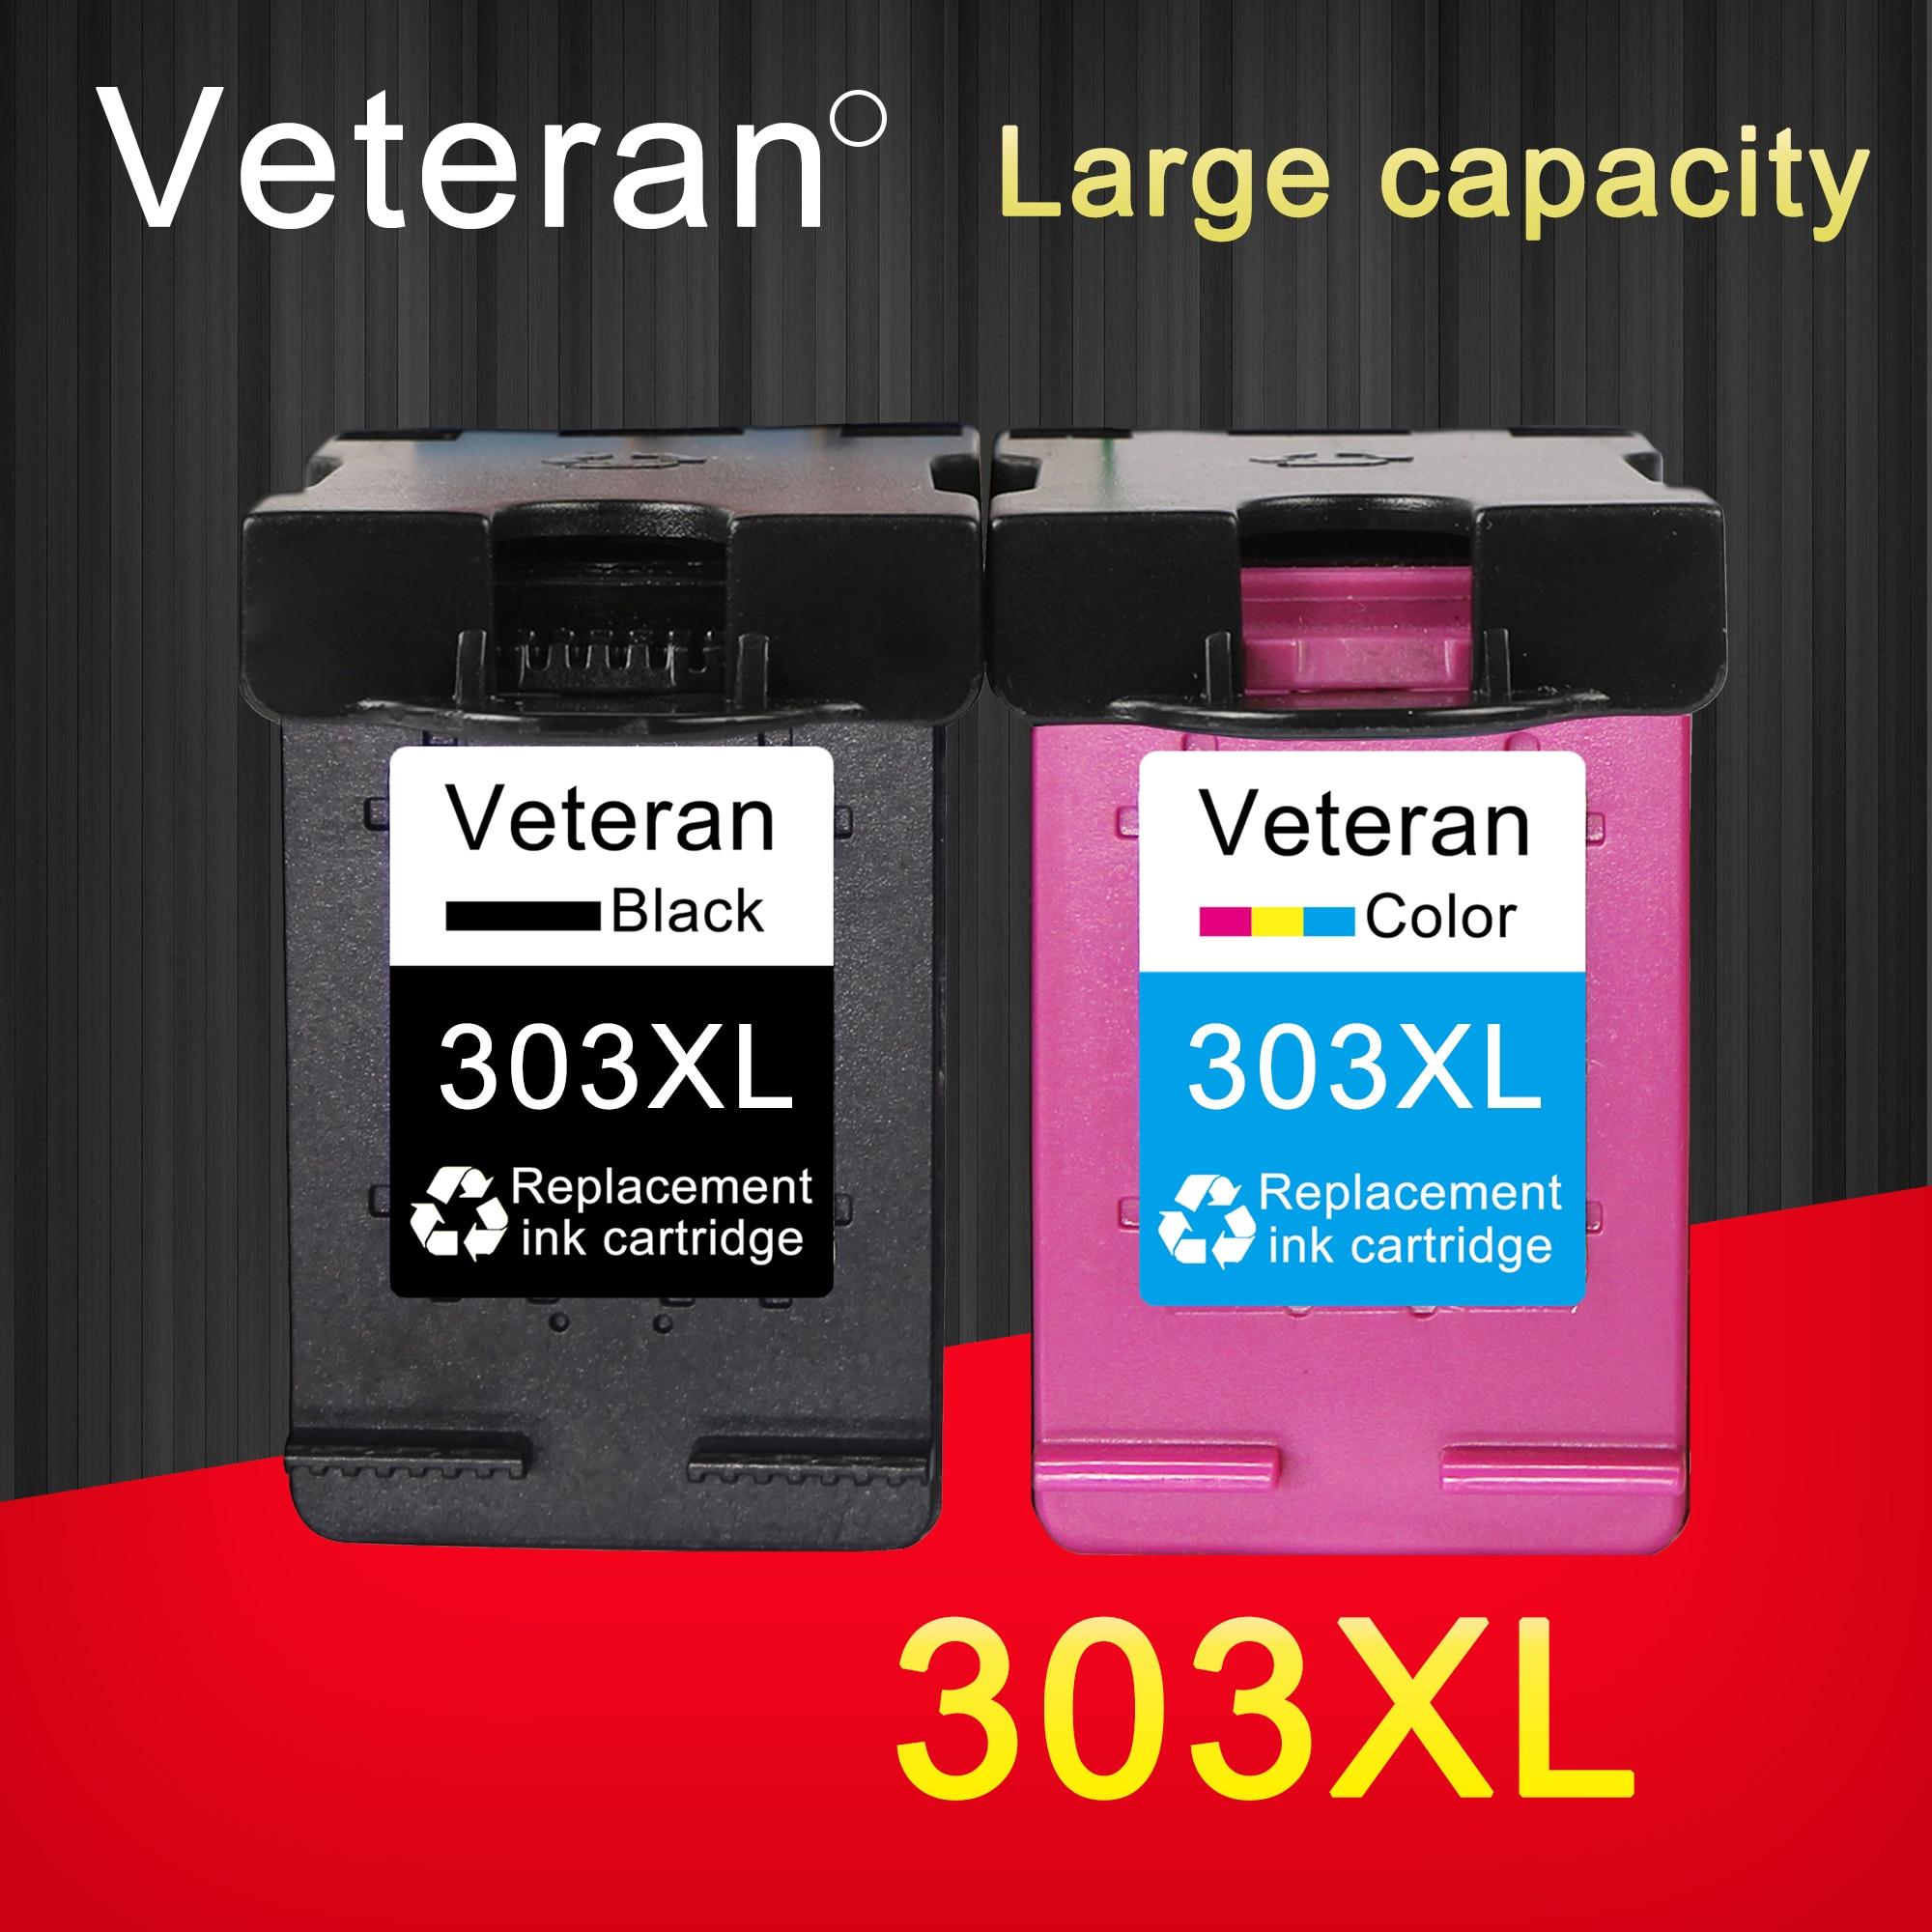 Veteran 303XL Cartridge Compatible for hp 303 xl Ink Cartridges hp303 for Envy 6020 6030 6220 6230 7120 7130 7134 7830 printer